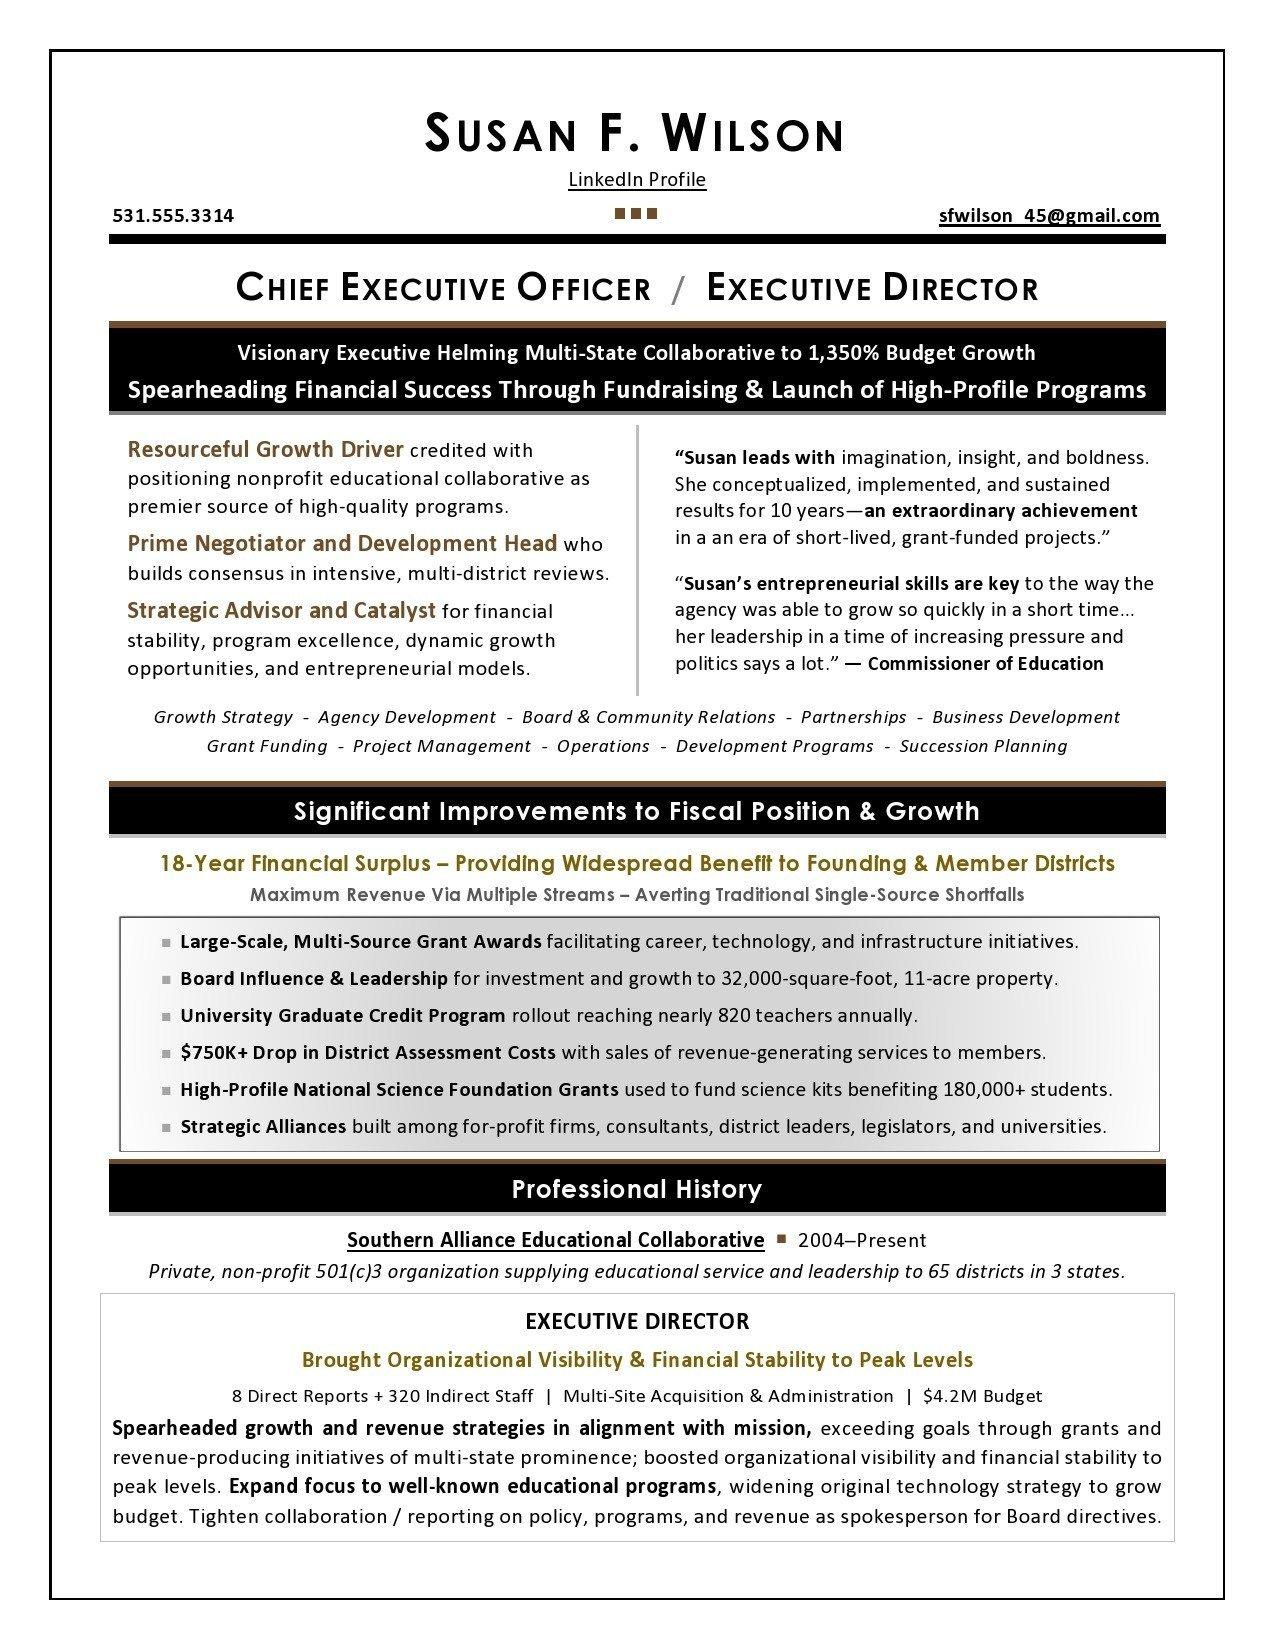 Executive Resume Samples Executive Resume Samples Executive Resume Sample And Complete Gu 20 Examples Zety A Stepbystep Gu To Writing An Executive Resume 20